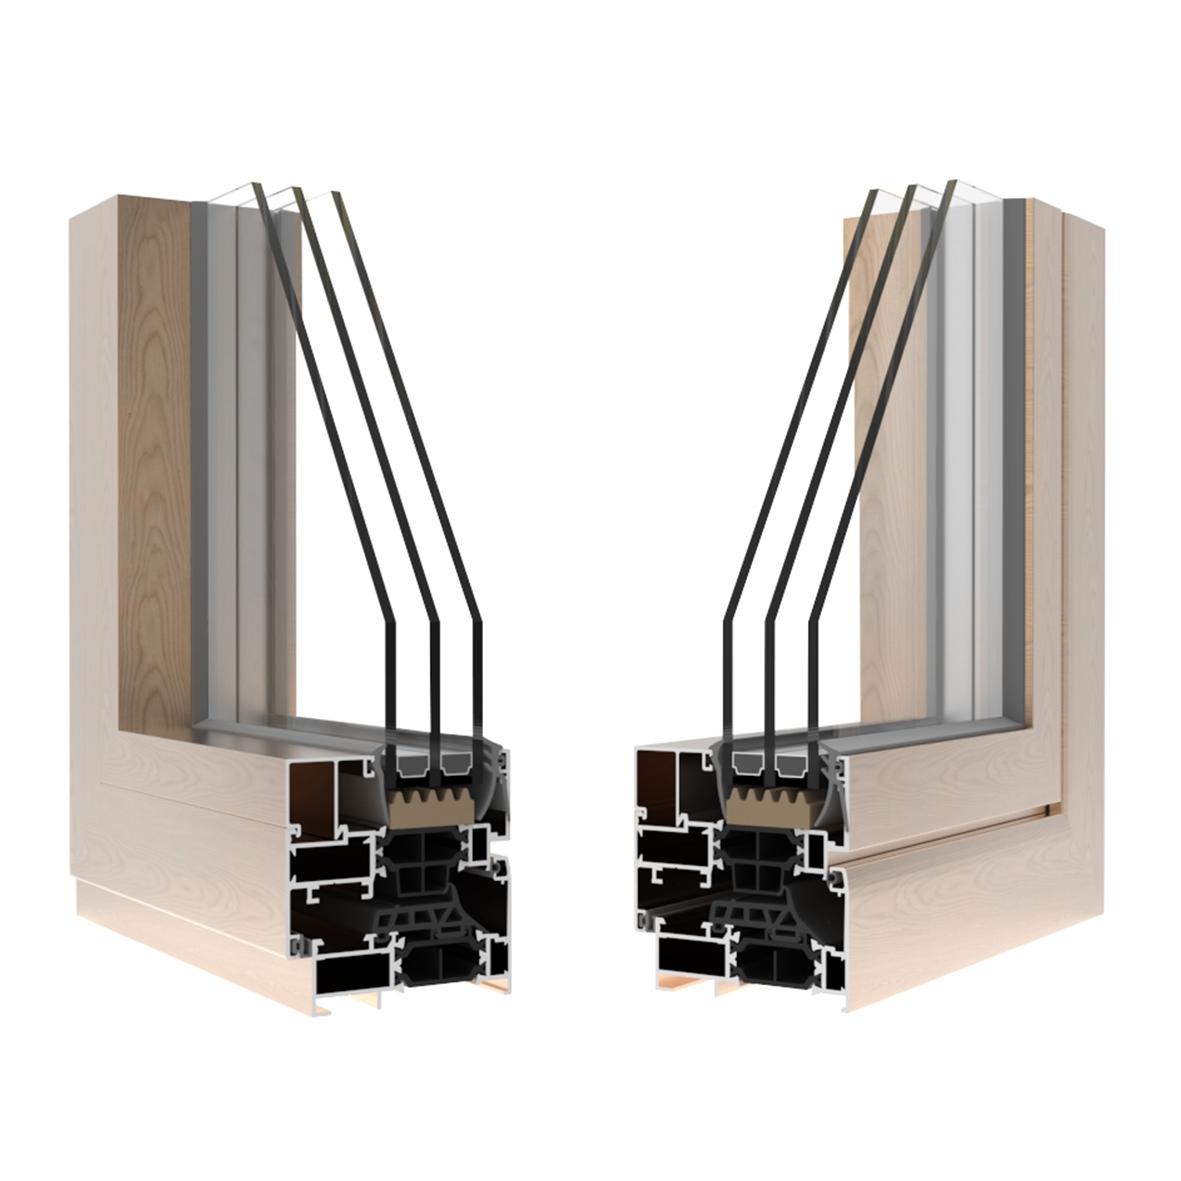 https://www.allpaint.it/wp-content/uploads/2021/07/thermika730-alluminio-allpaint.jpg